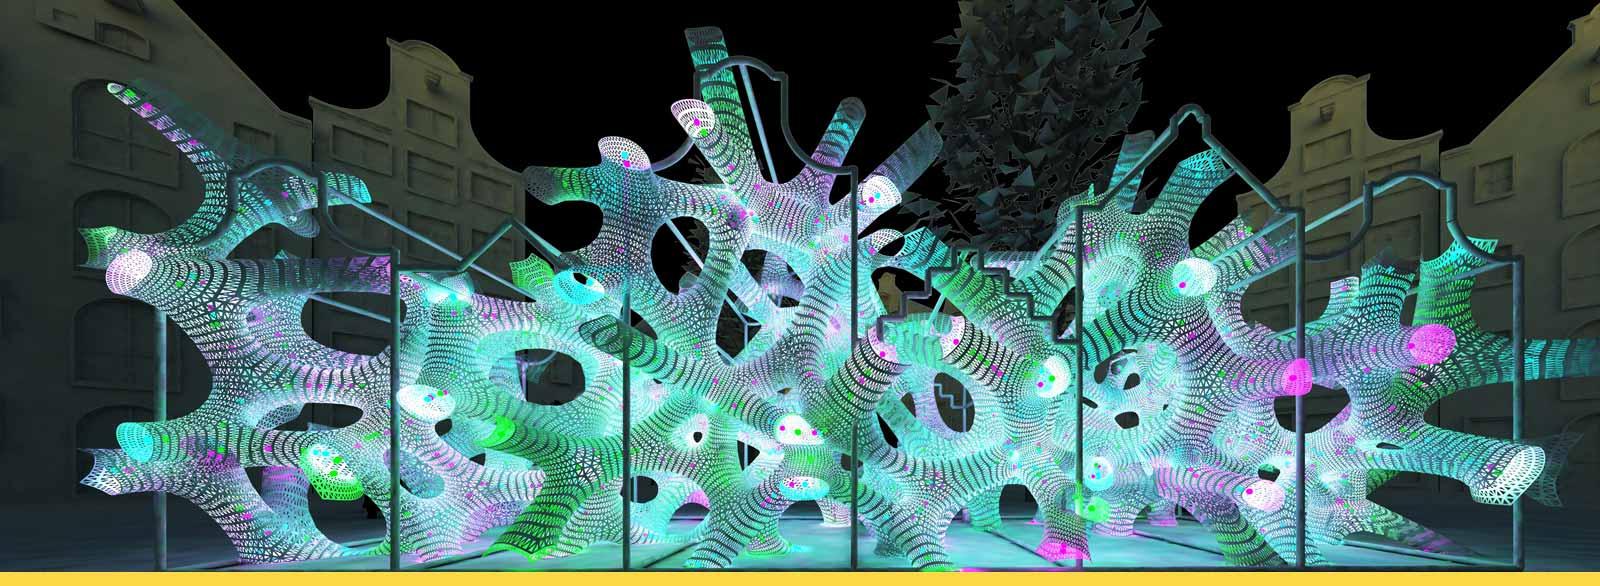 amsterdam light festival rhizome house